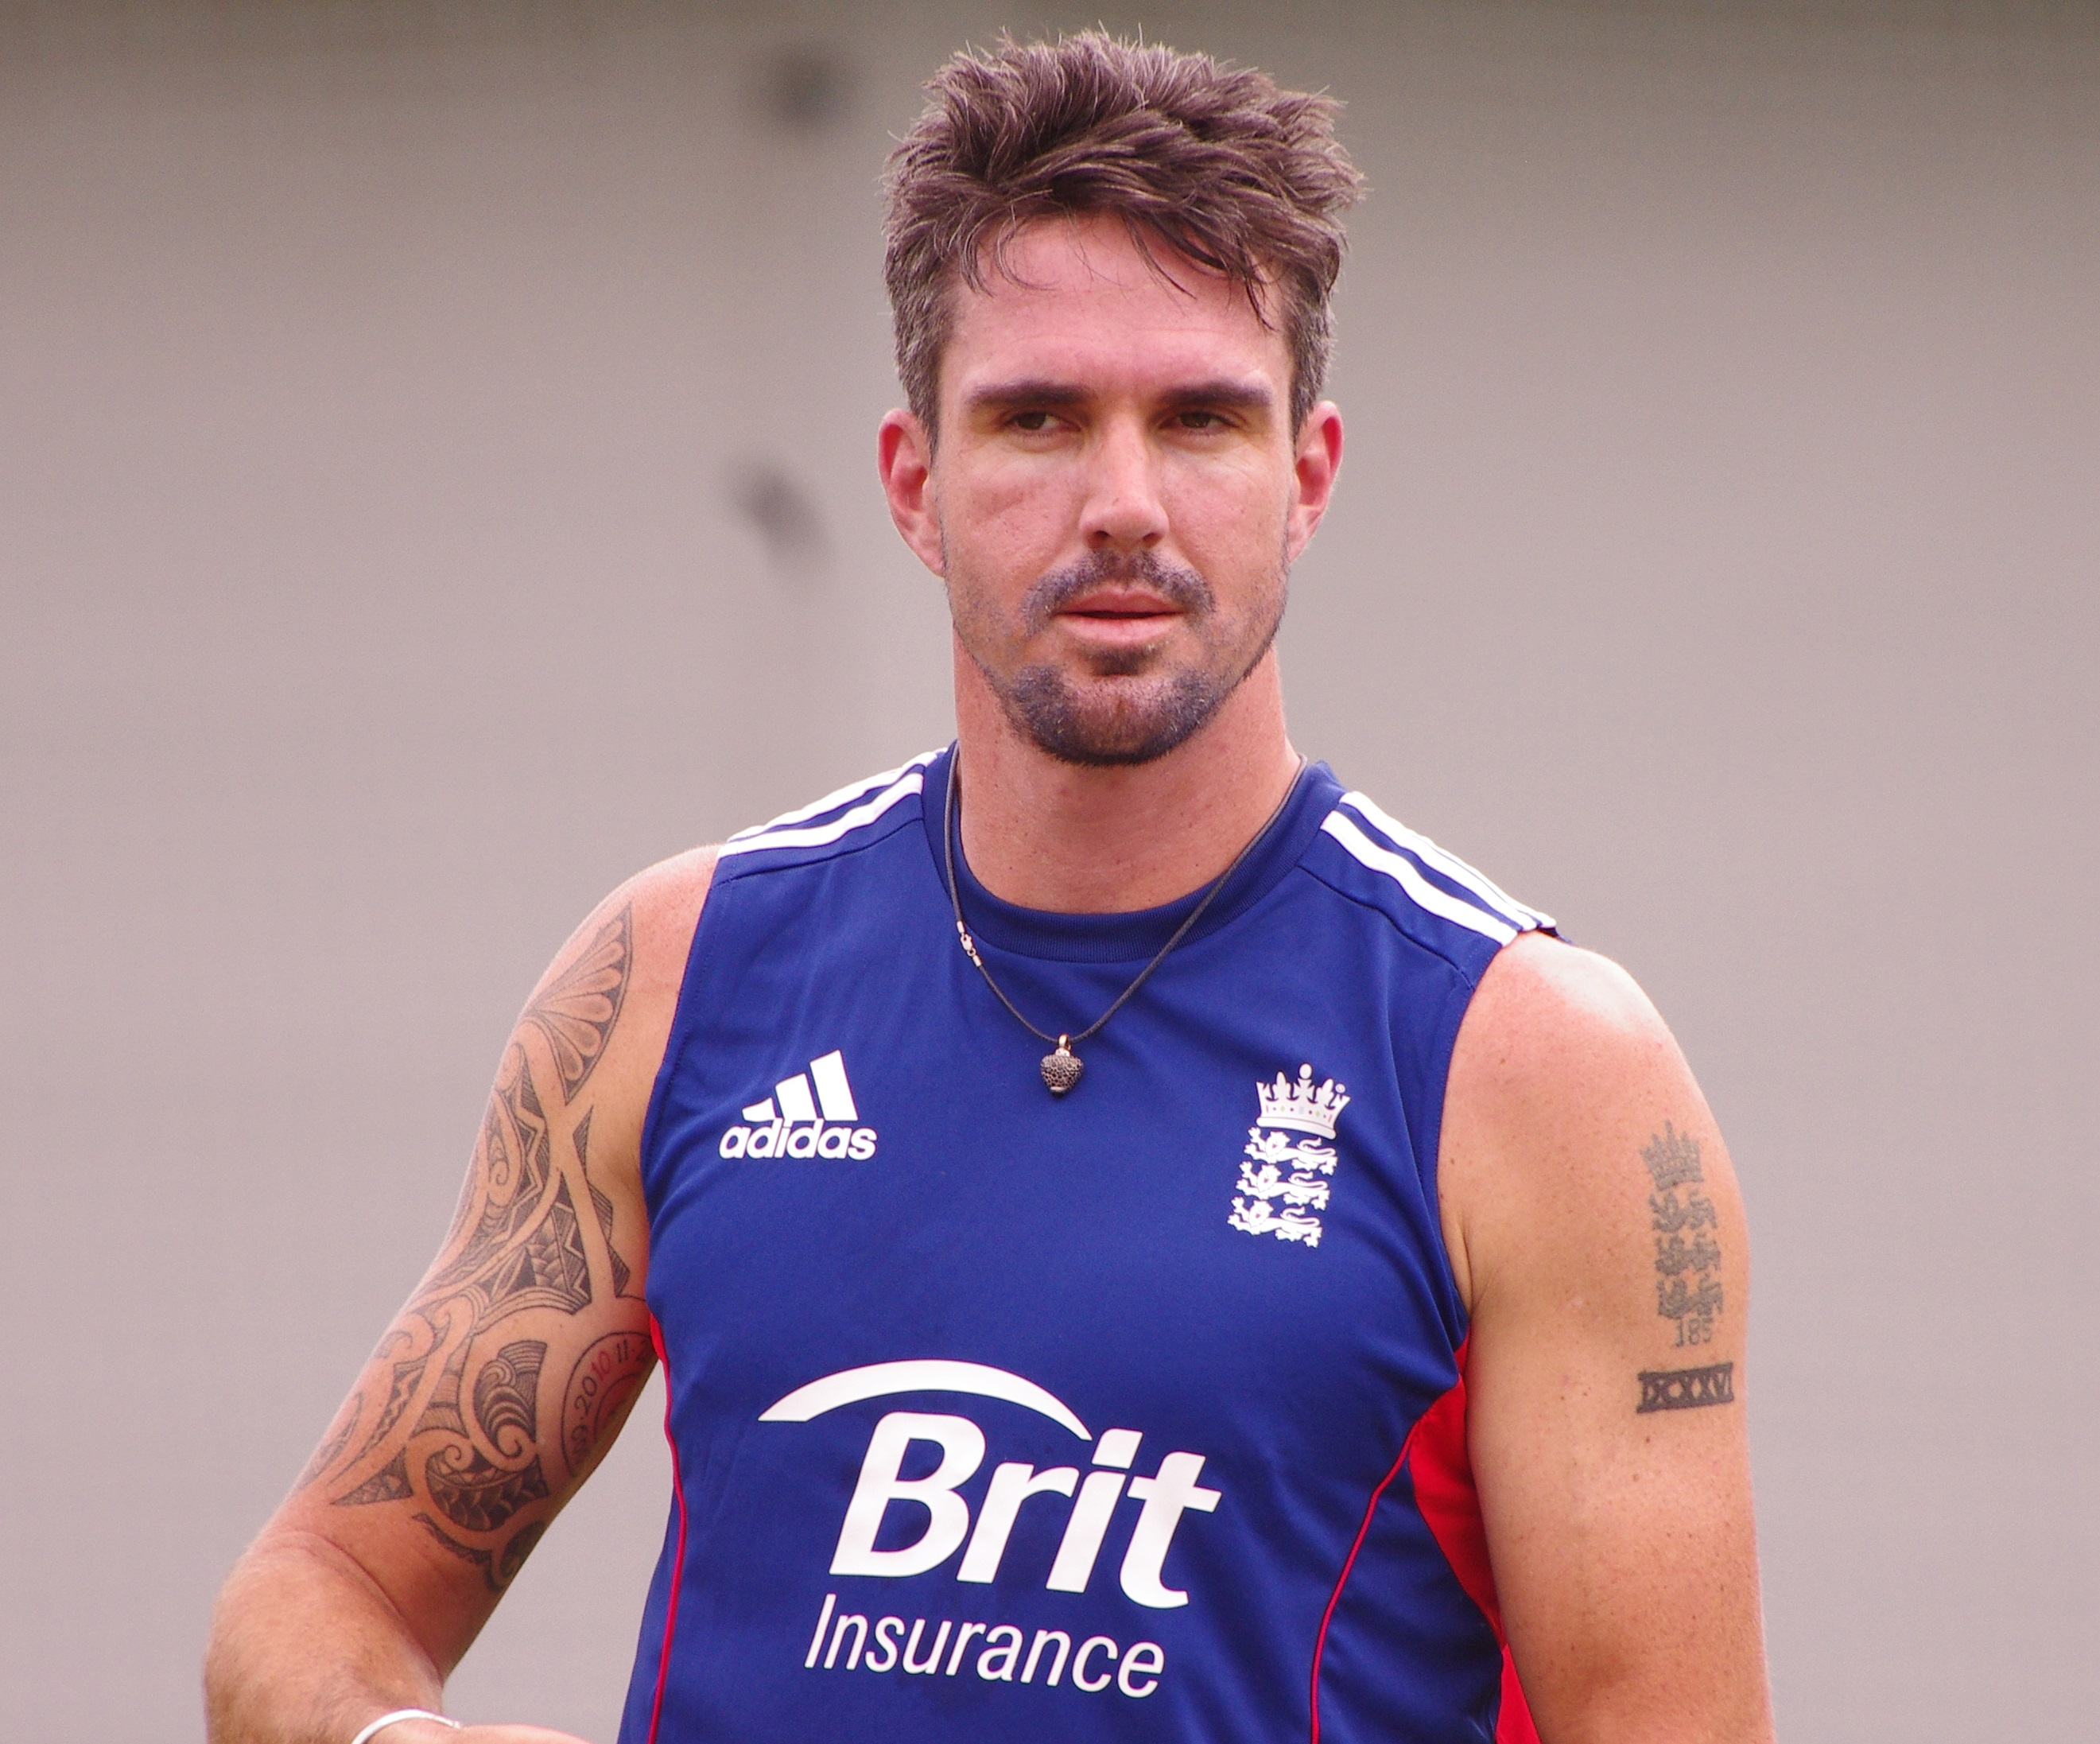 Kevin Pietersen is hoping to return in international cricket